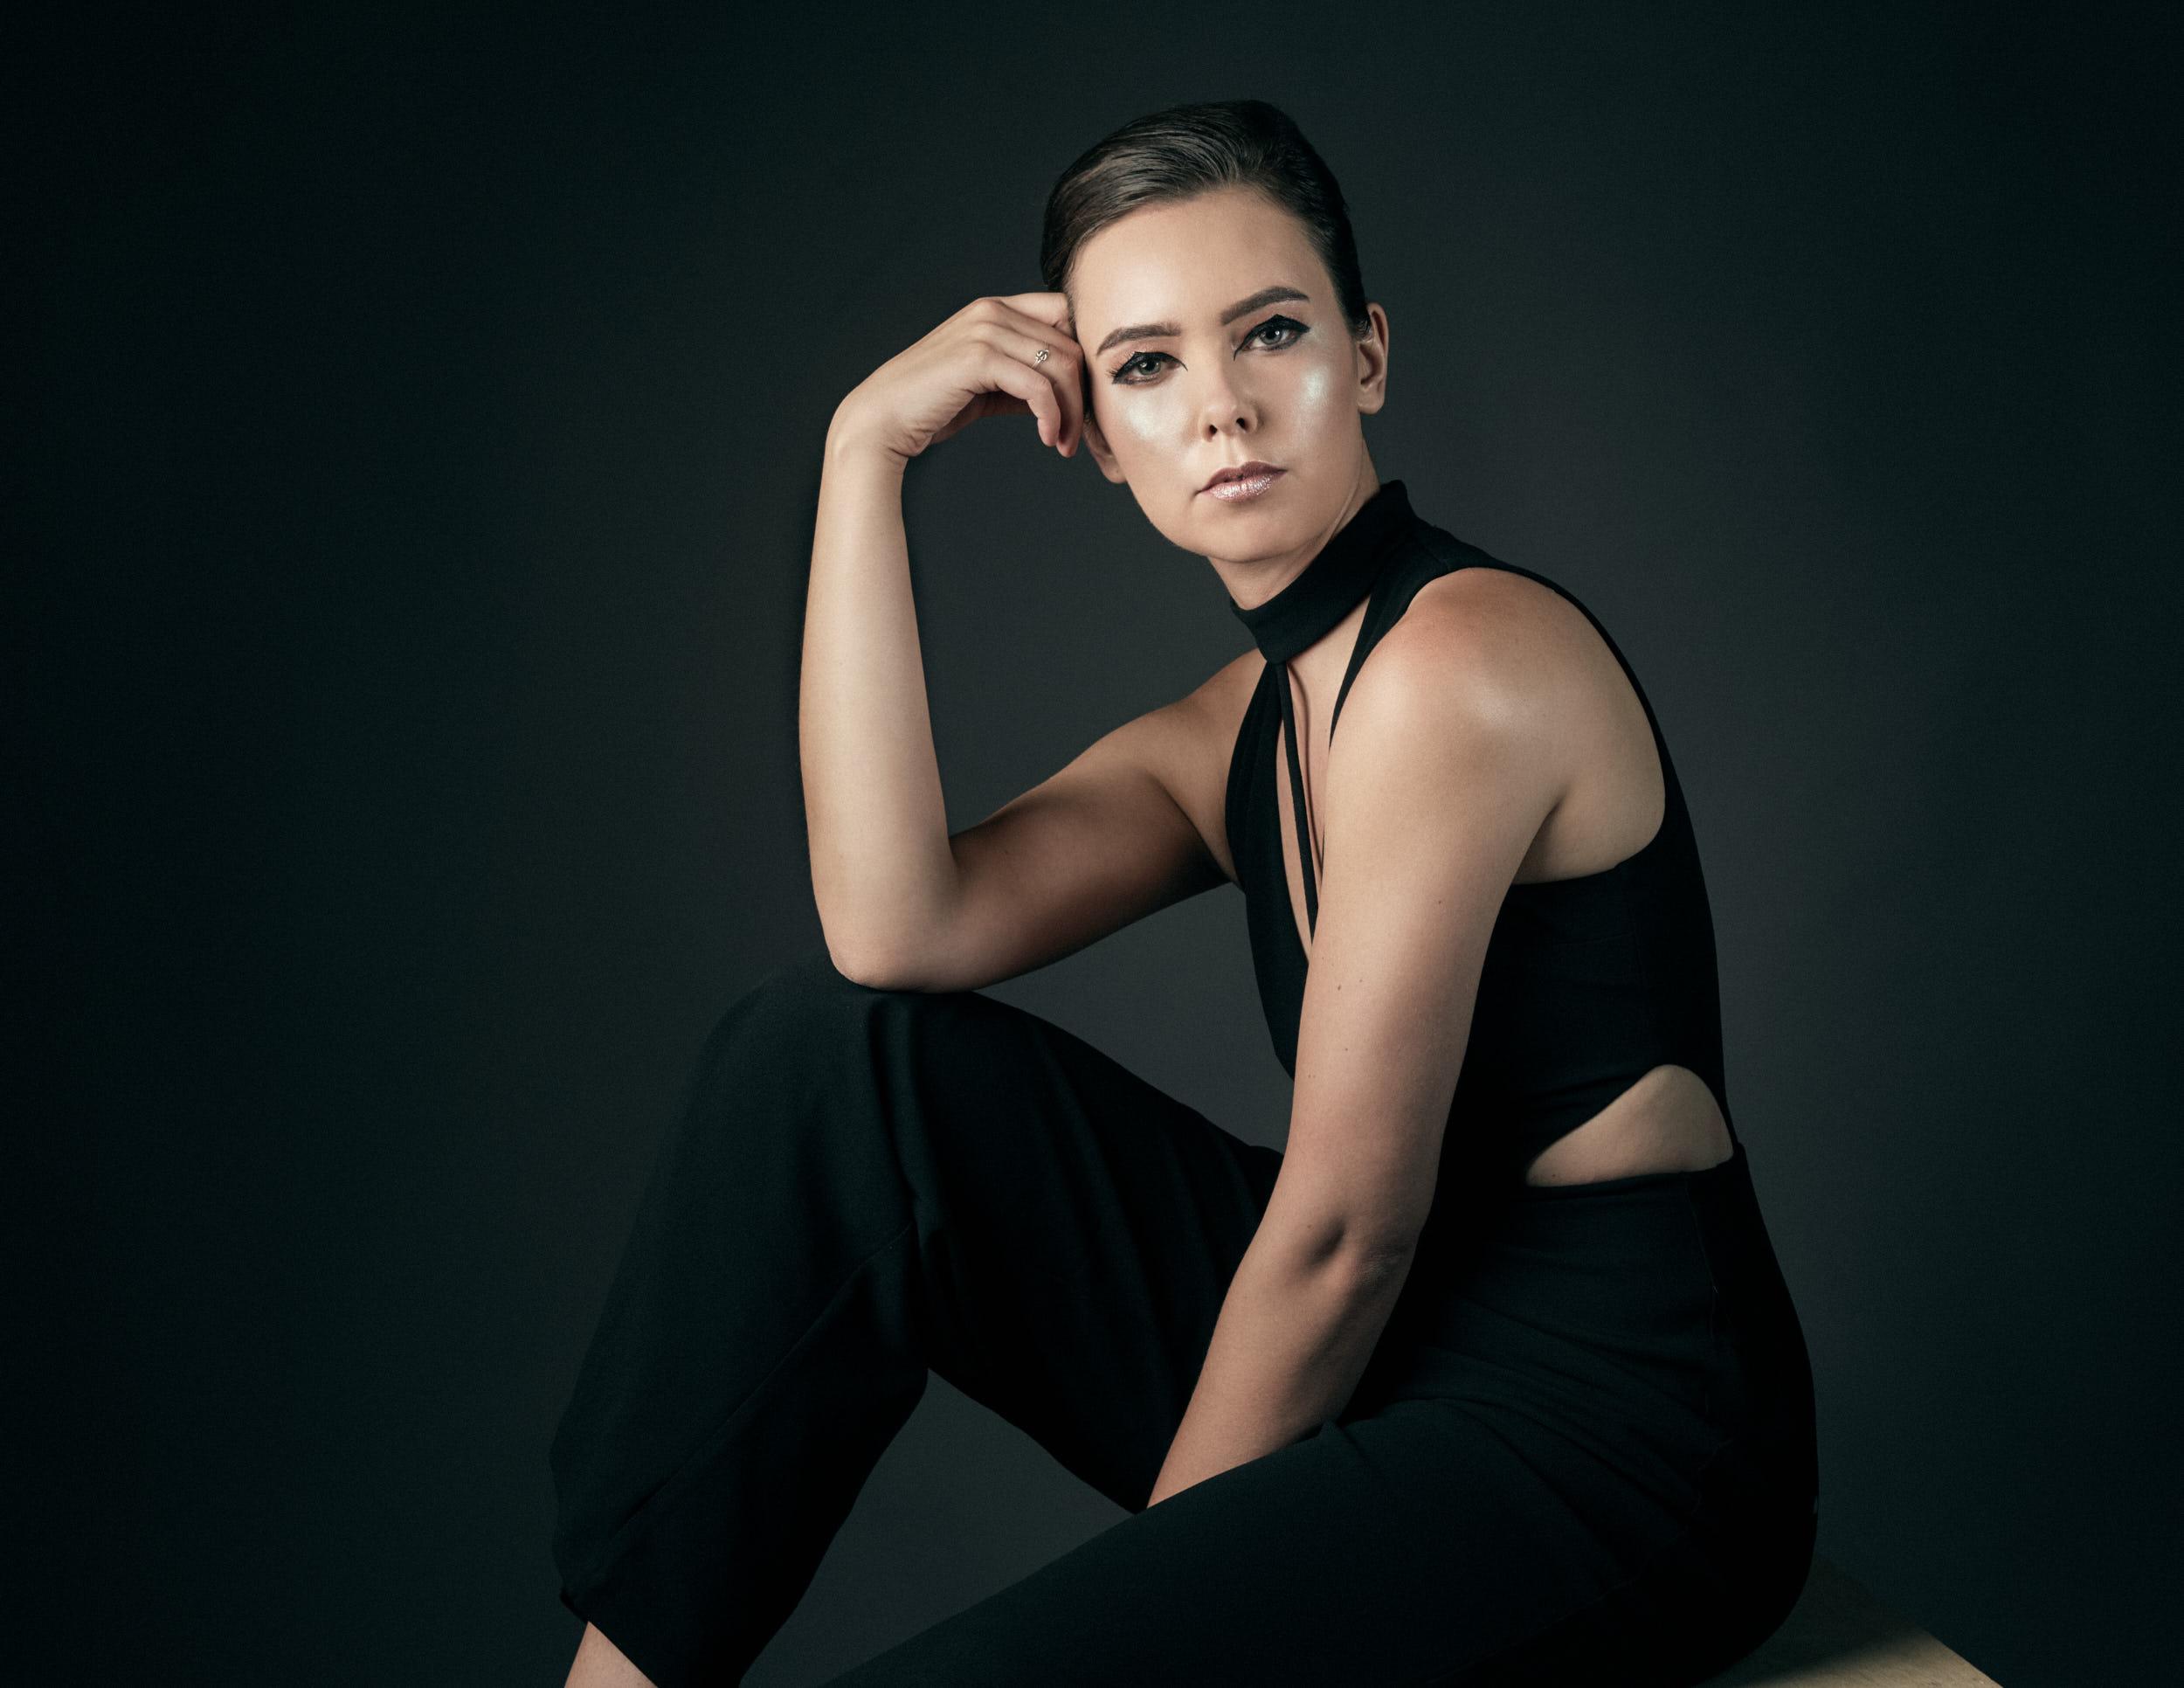 Studio fashion photography session with Amandine Marie. Photographed by Paul Davis, Tucson, Arizona.